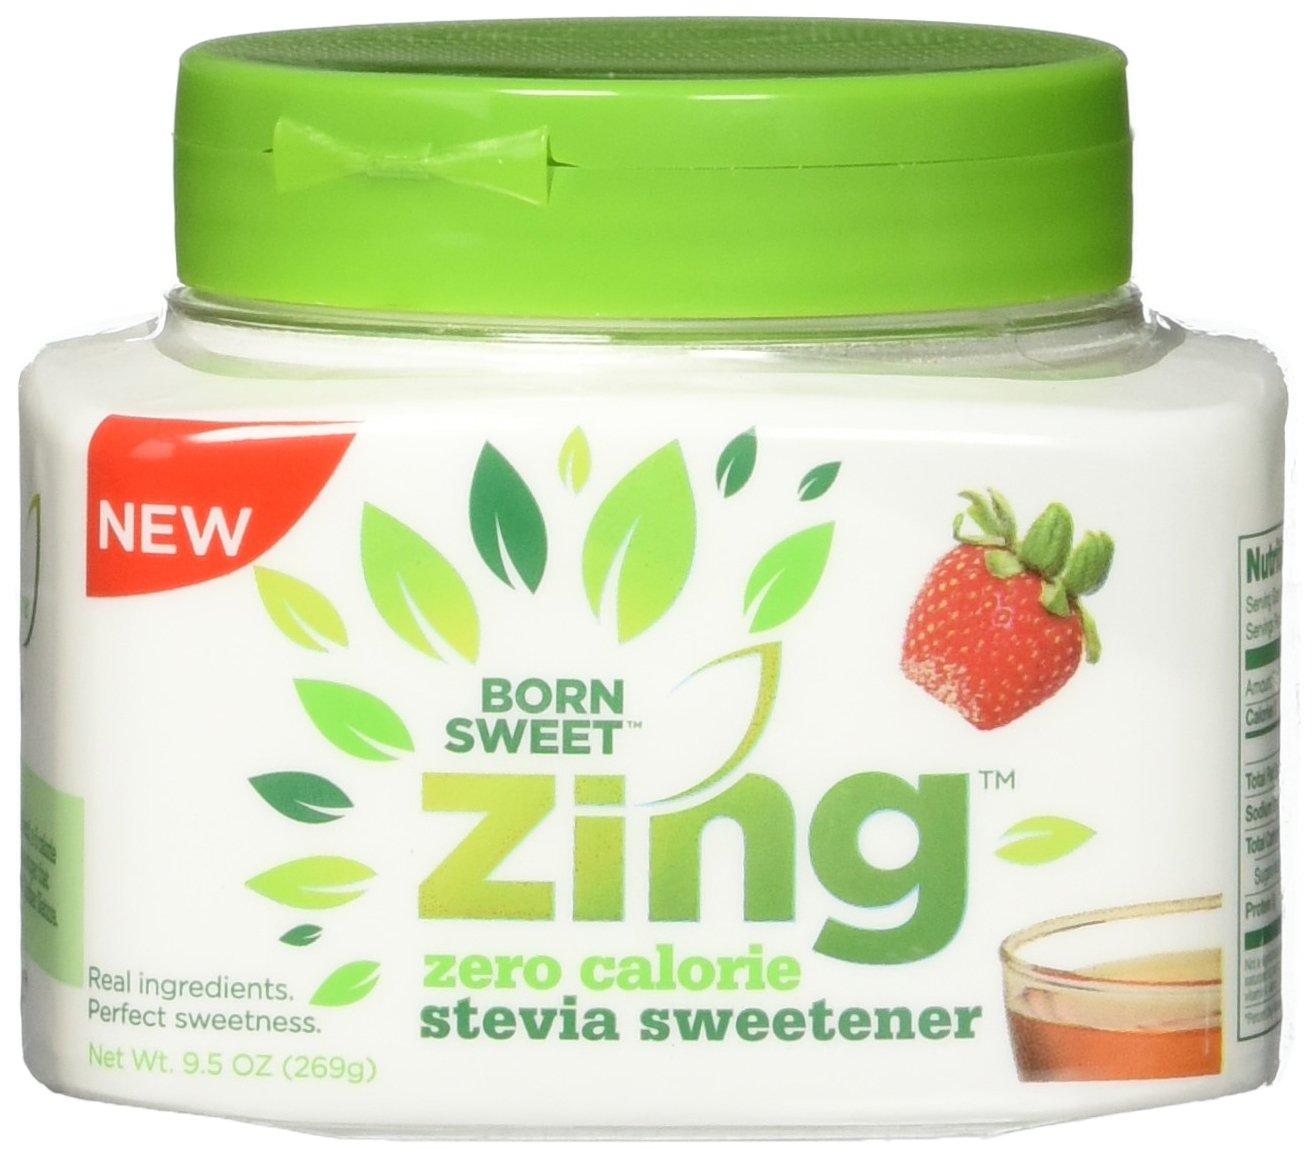 """Born Sweet Zing"" Zero Calorie Stevia Sweetener Easy-Spoon Jar - 1 Jar, 9.5 Oz"